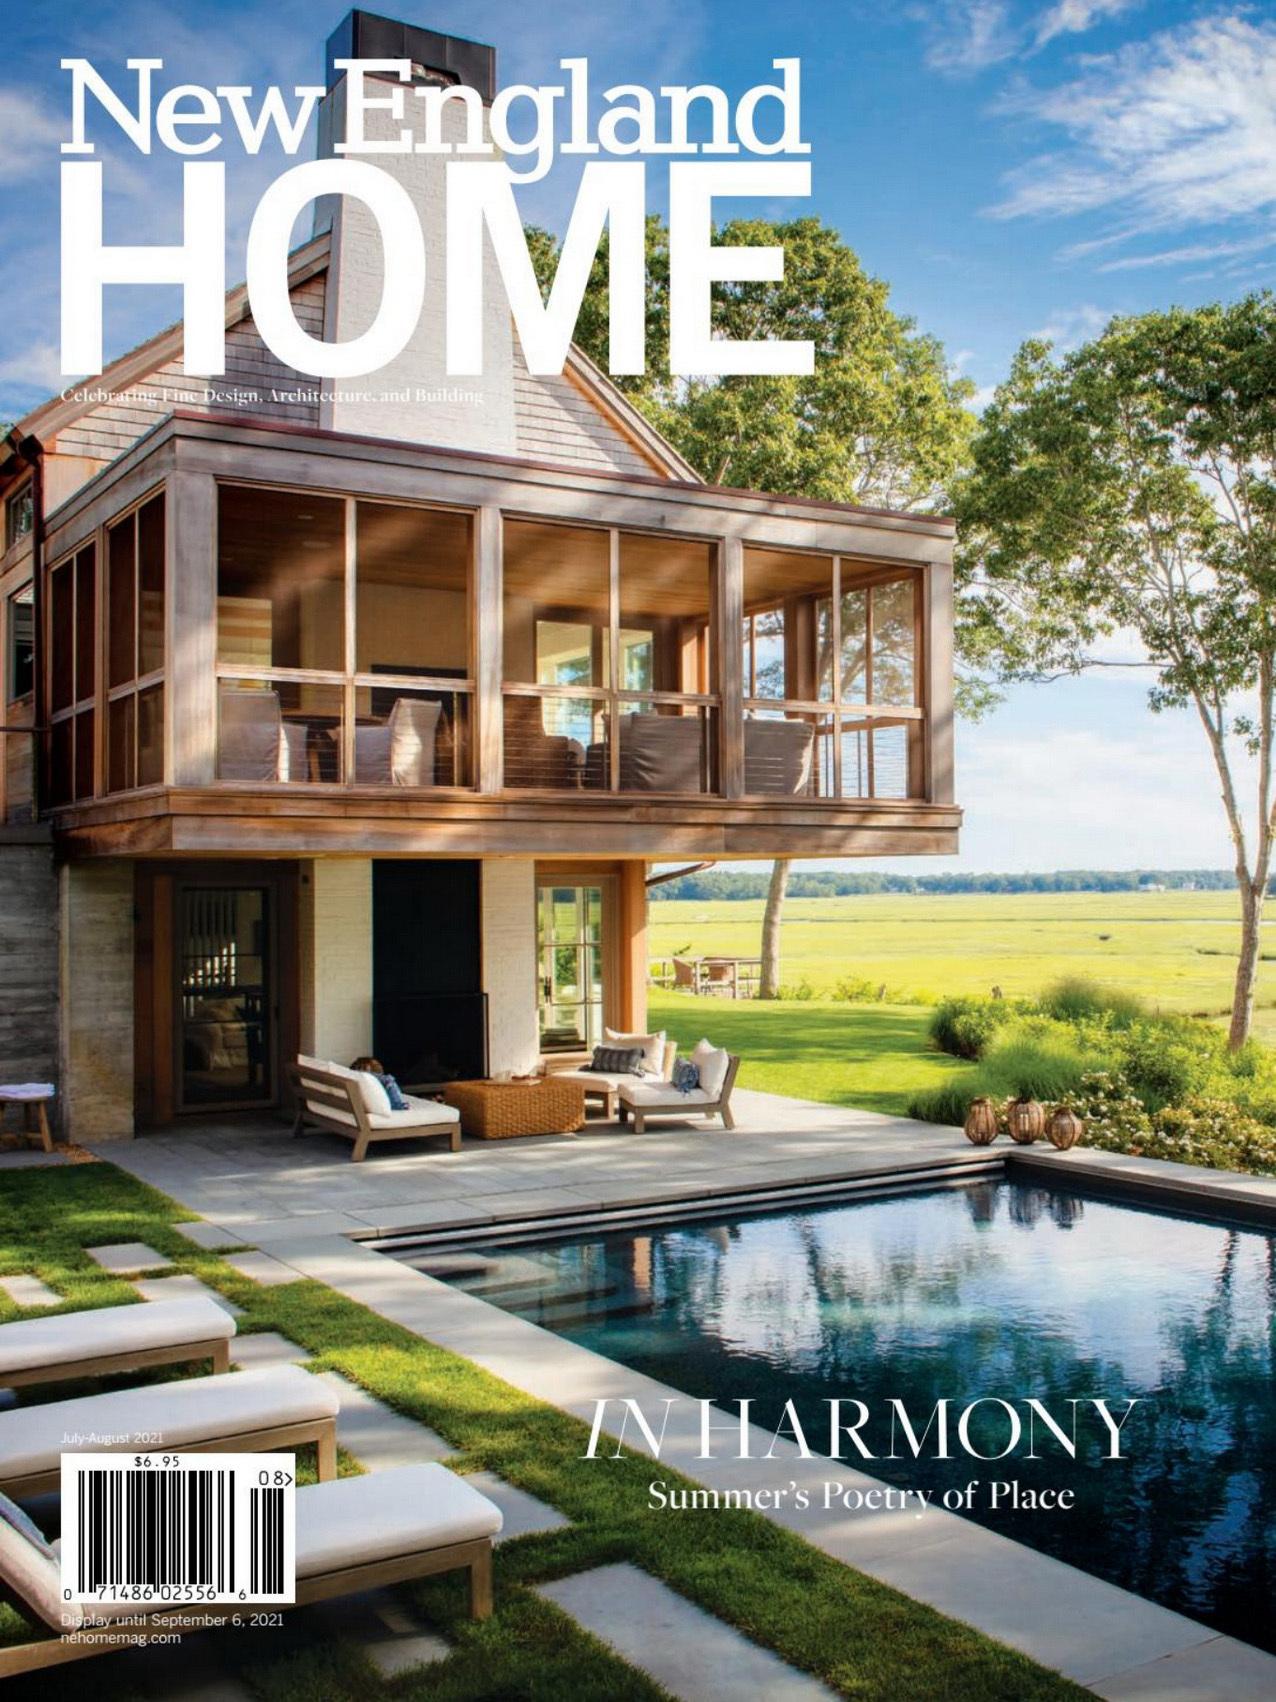 《New England Home》美国室内时尚杂志2021年07-08月号